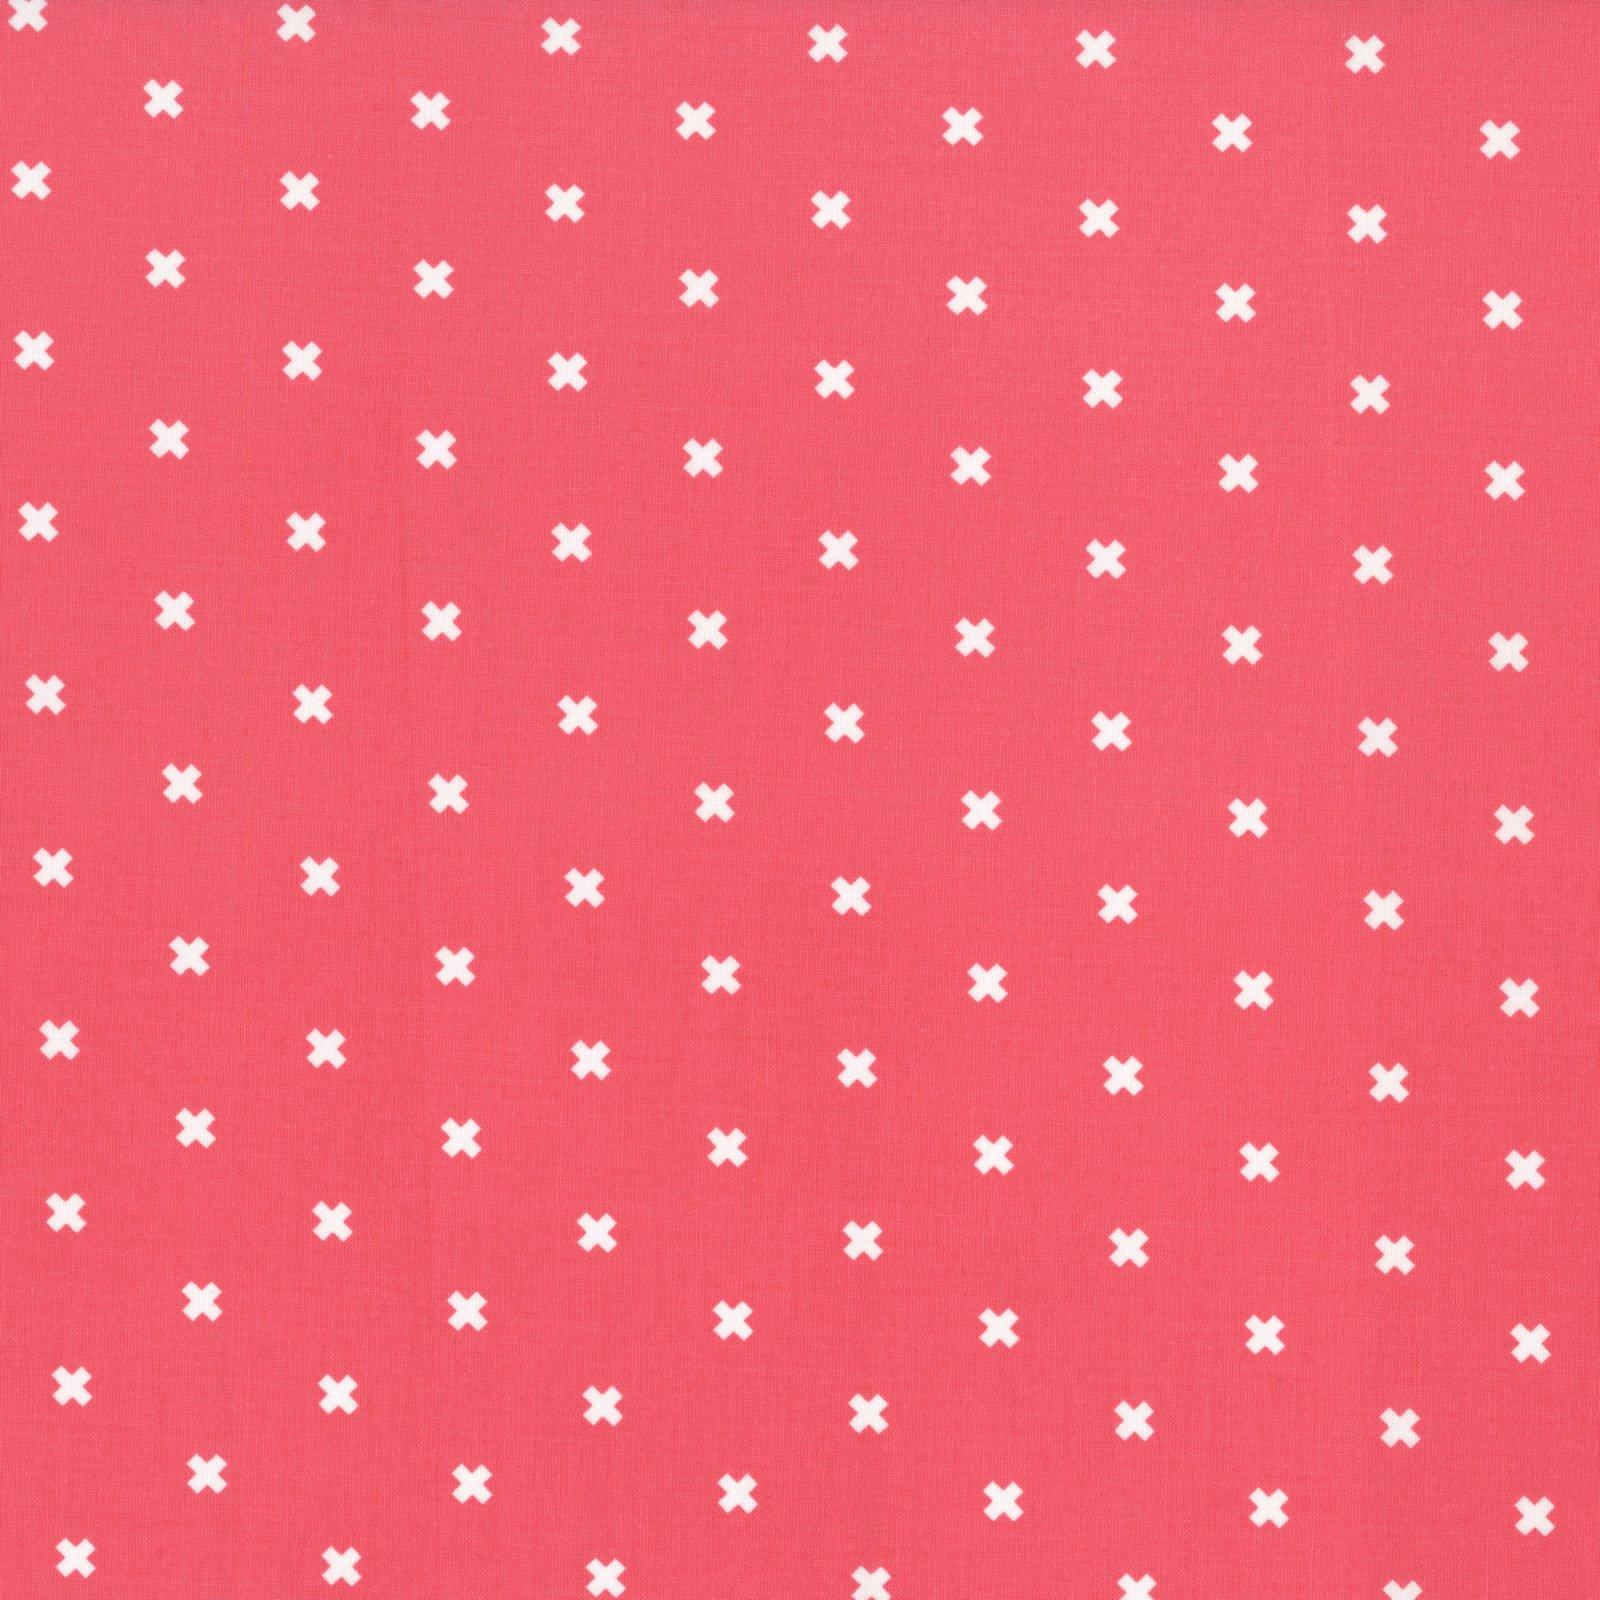 C5001-005 XoXo Pink Cheeks Cotton  Steel Basics